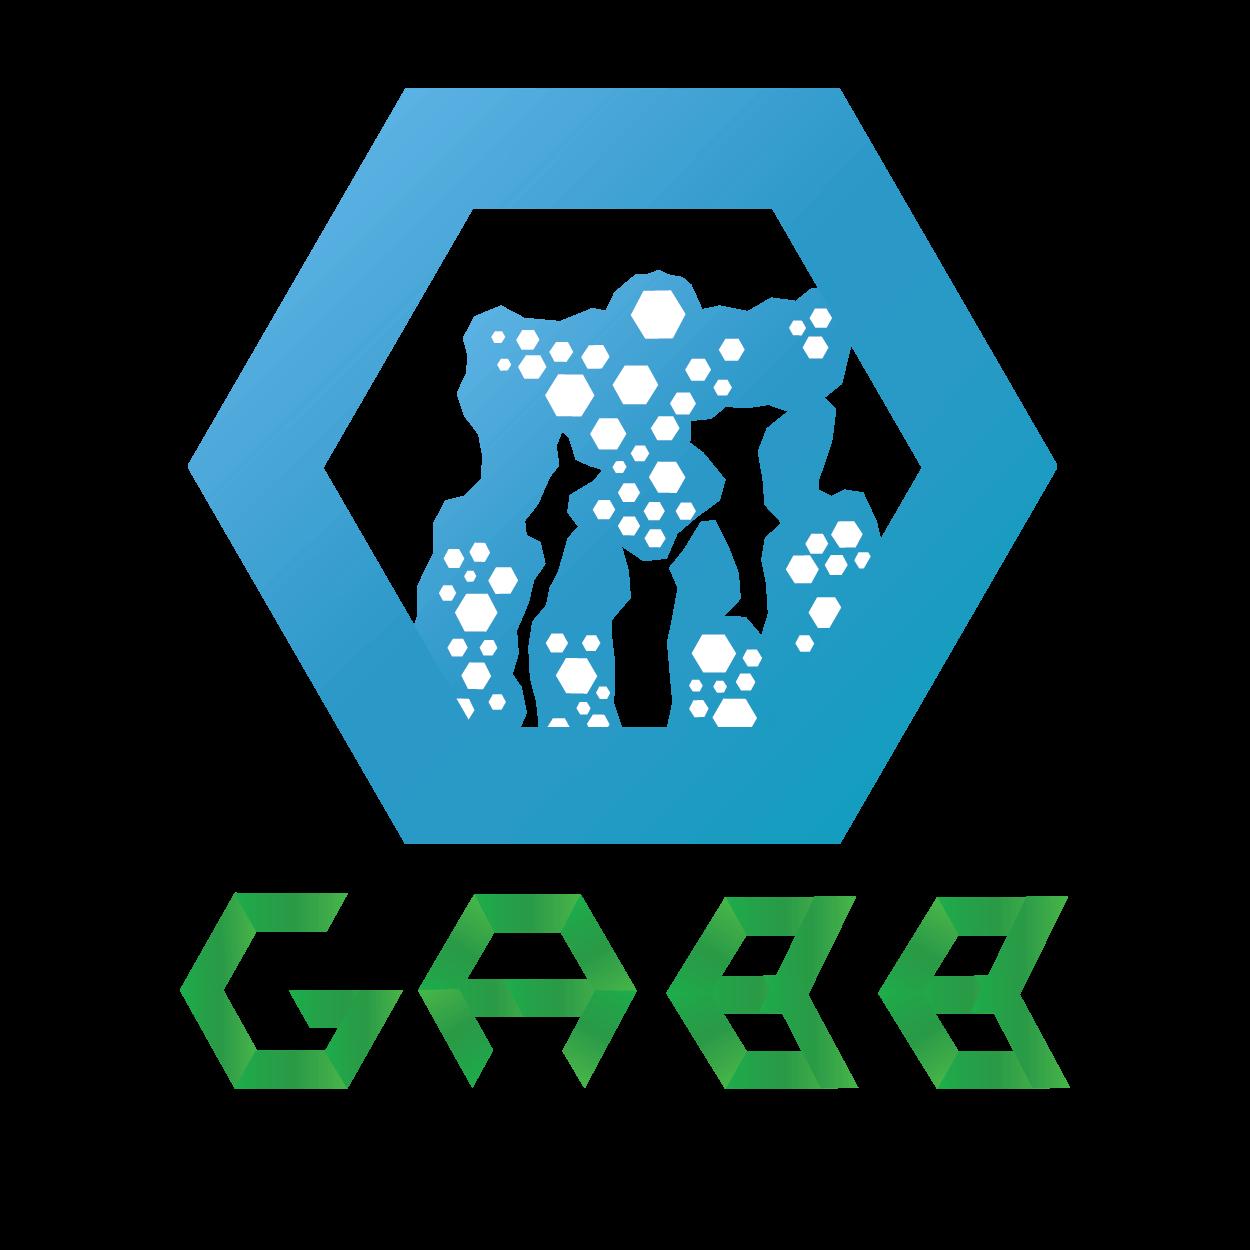 GOLEMS G.A.B.B. OÜ Logo